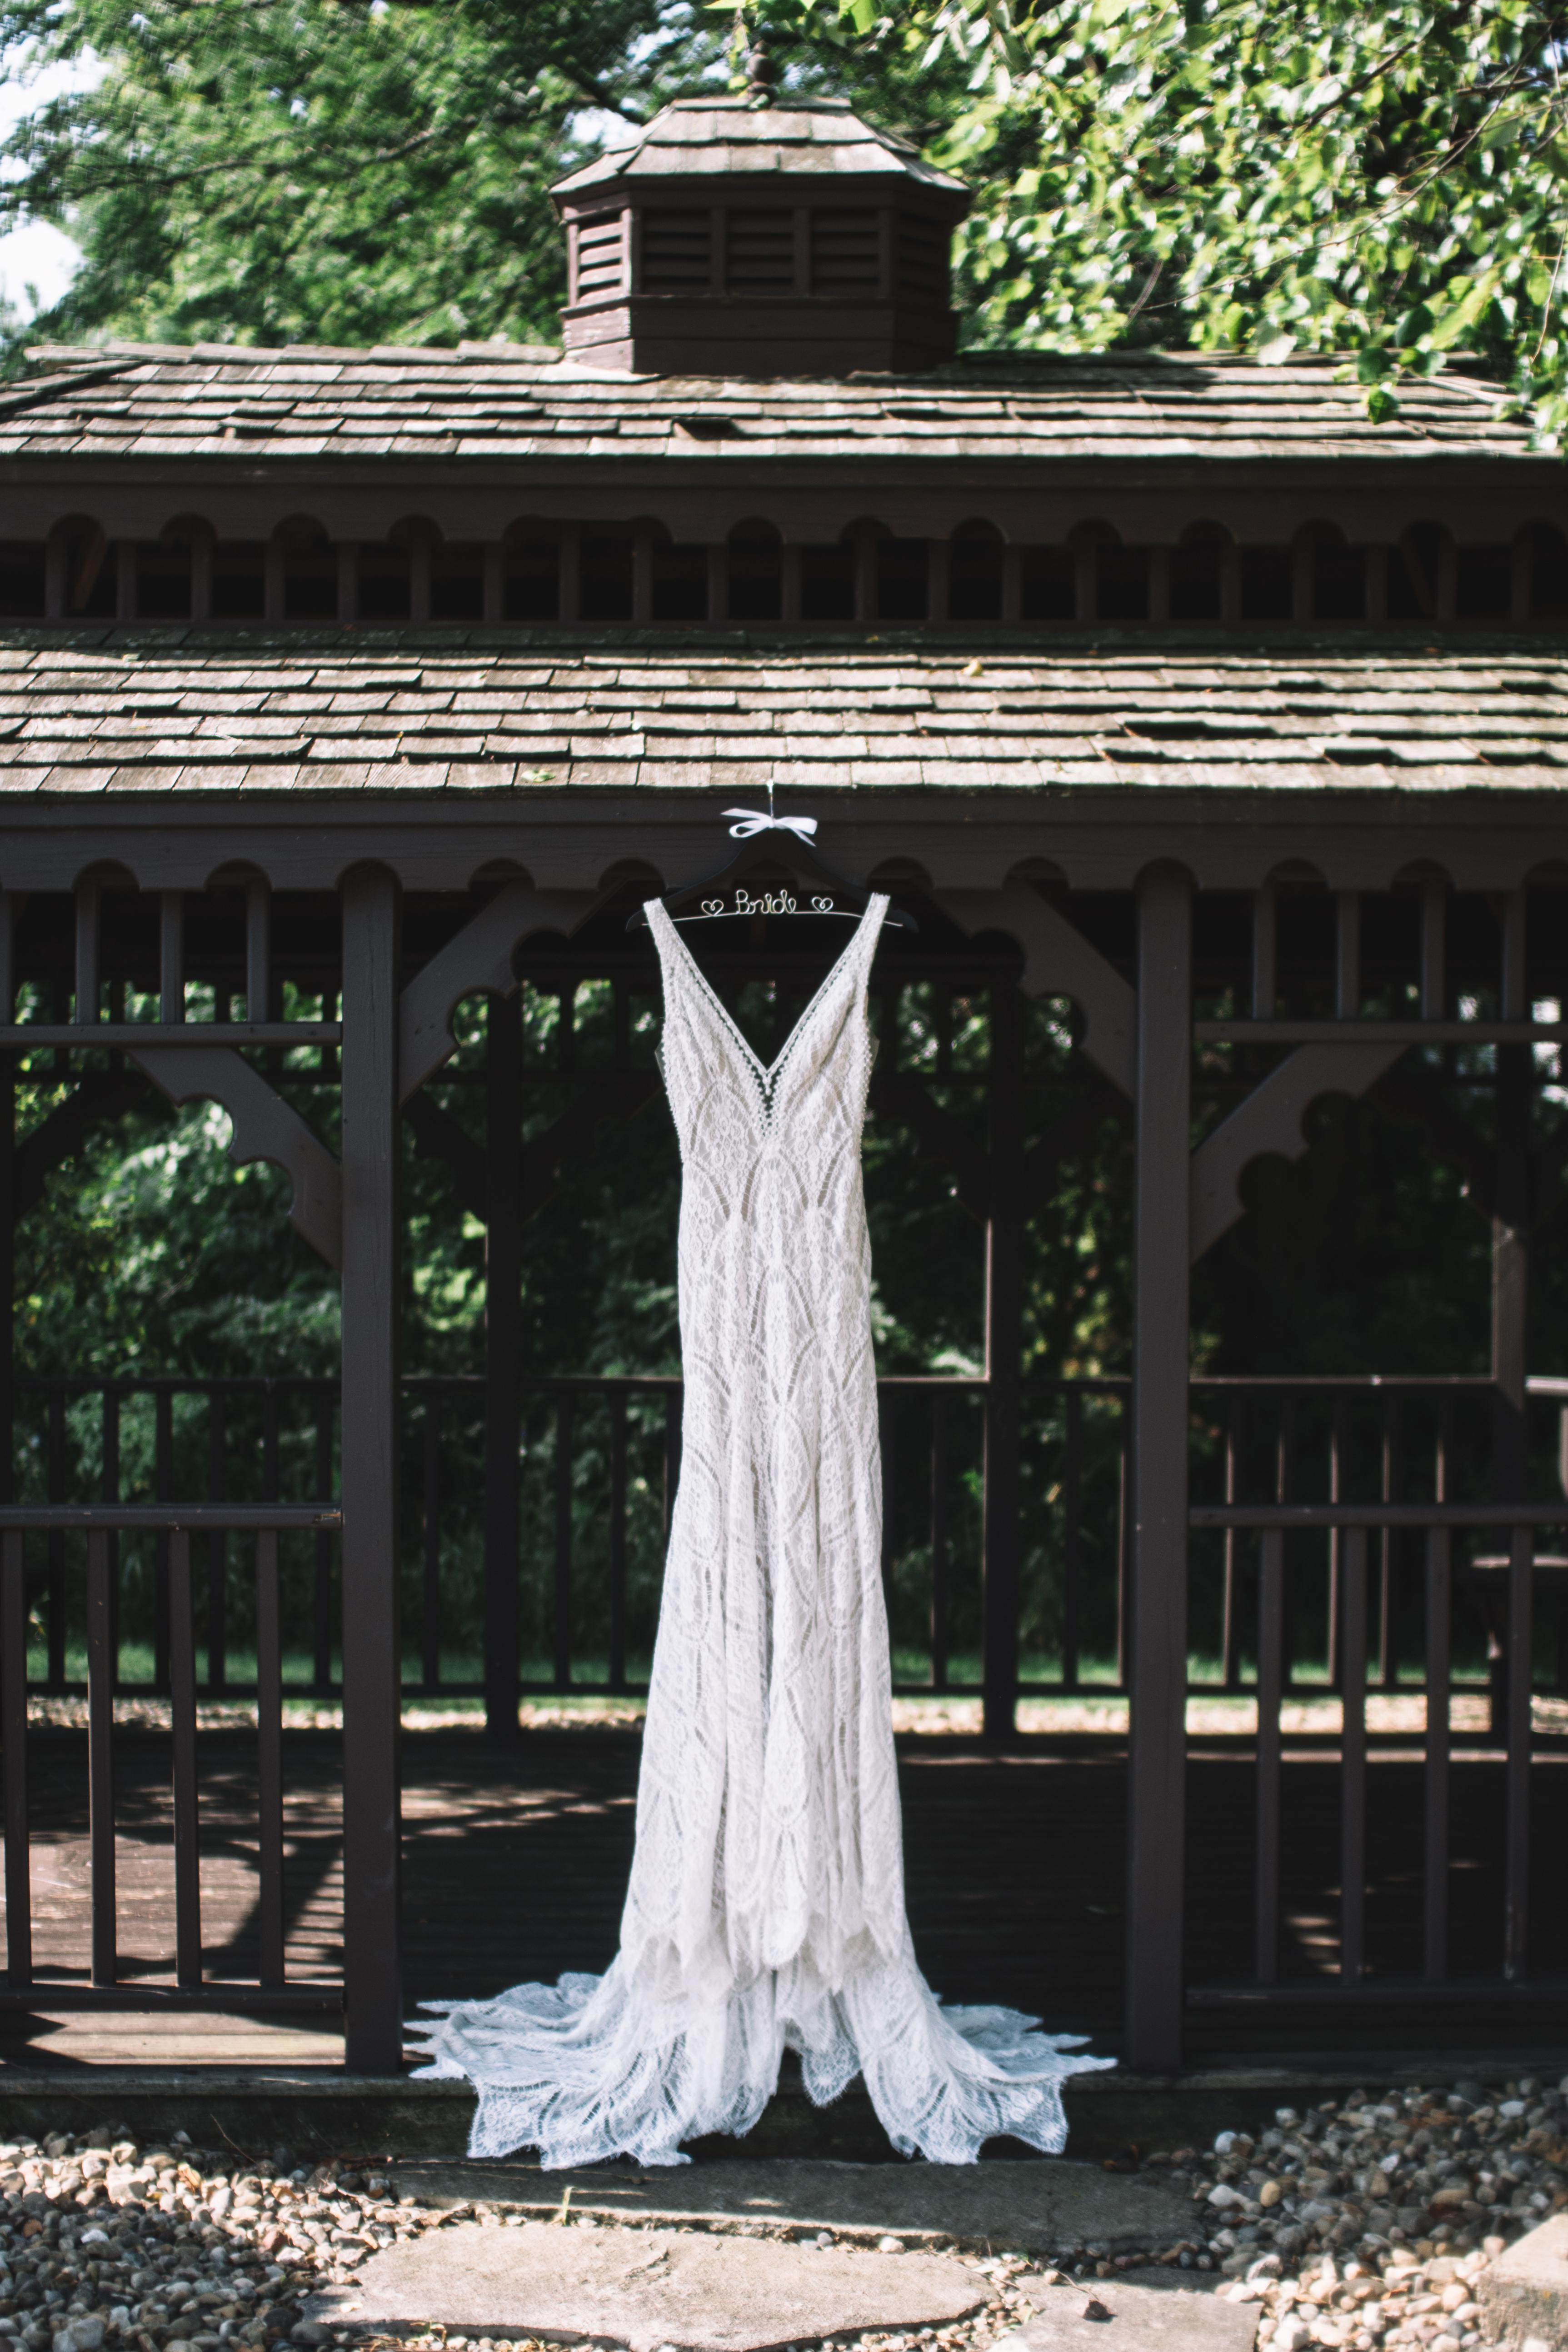 peoria il wedding dress, peoria il wedding photographer, wedding dress photo, northwoods community c